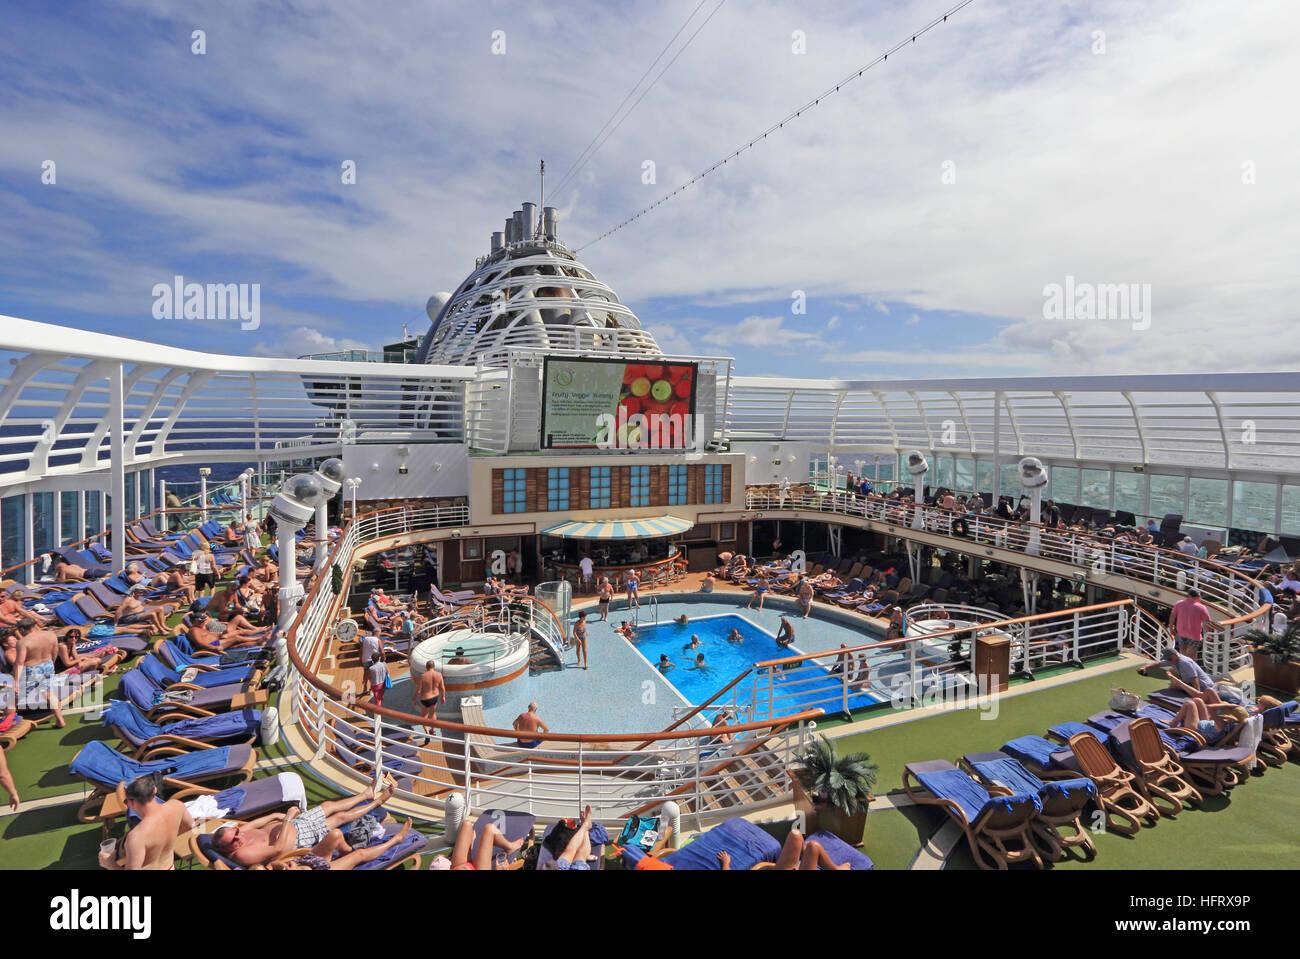 Sun deck, pool and sea screen on P & O cruise ship Azura, cruising in the Caribbean - Stock Image